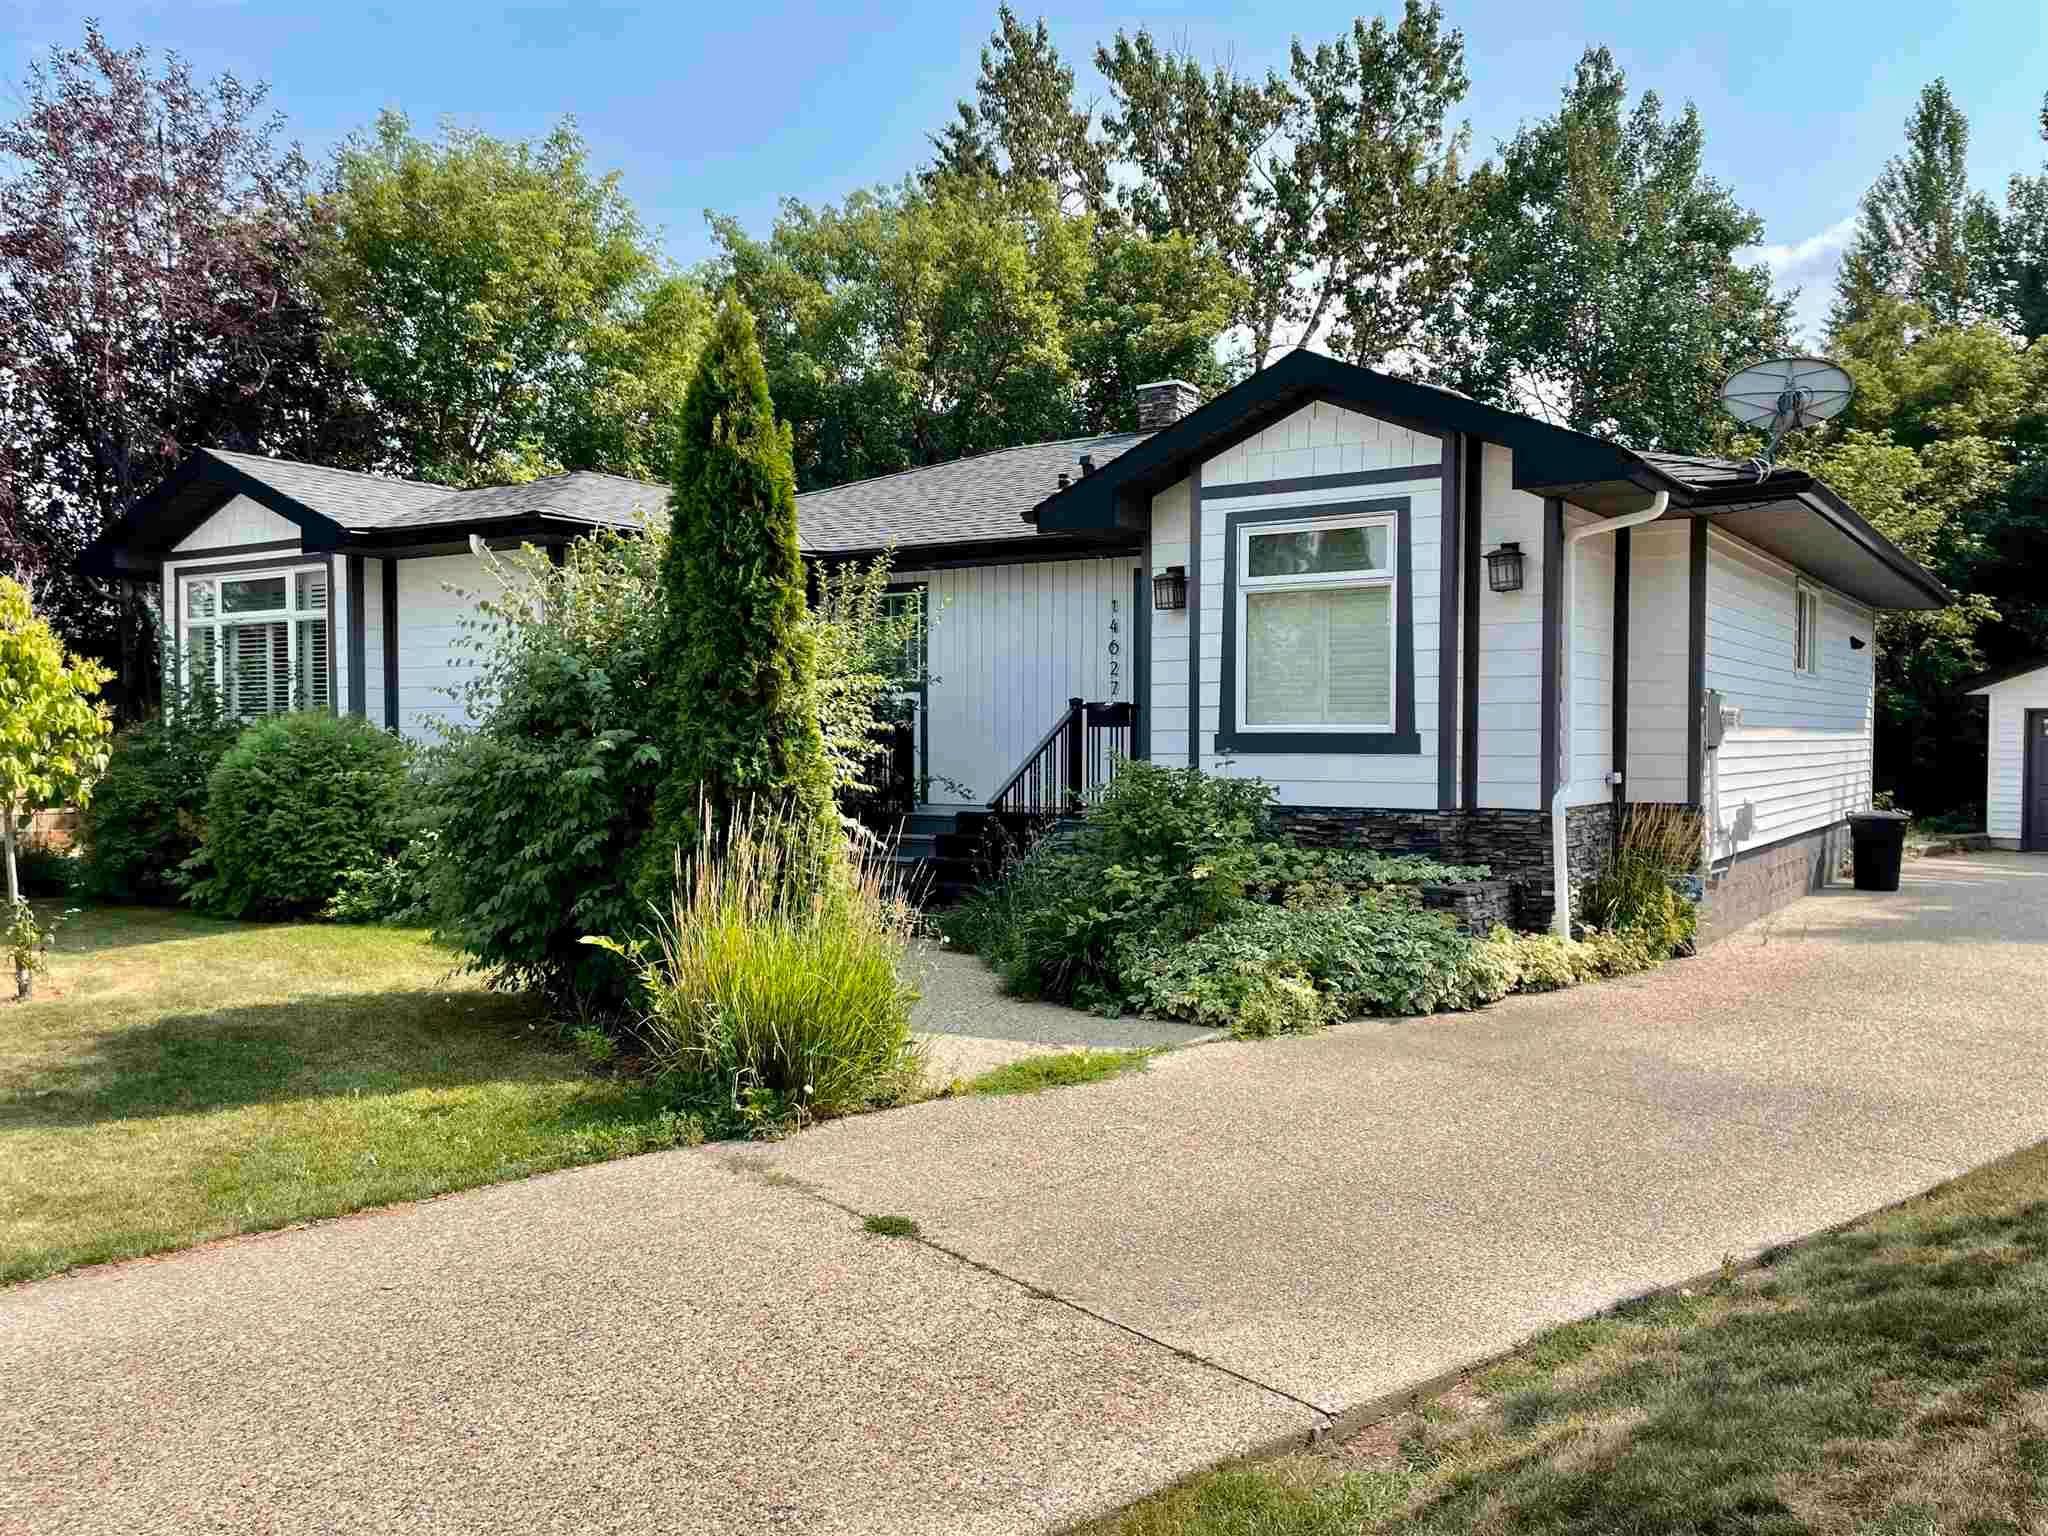 Main Photo: 14627 MACKENZIE Drive in Edmonton: Zone 10 House for sale : MLS®# E4255486